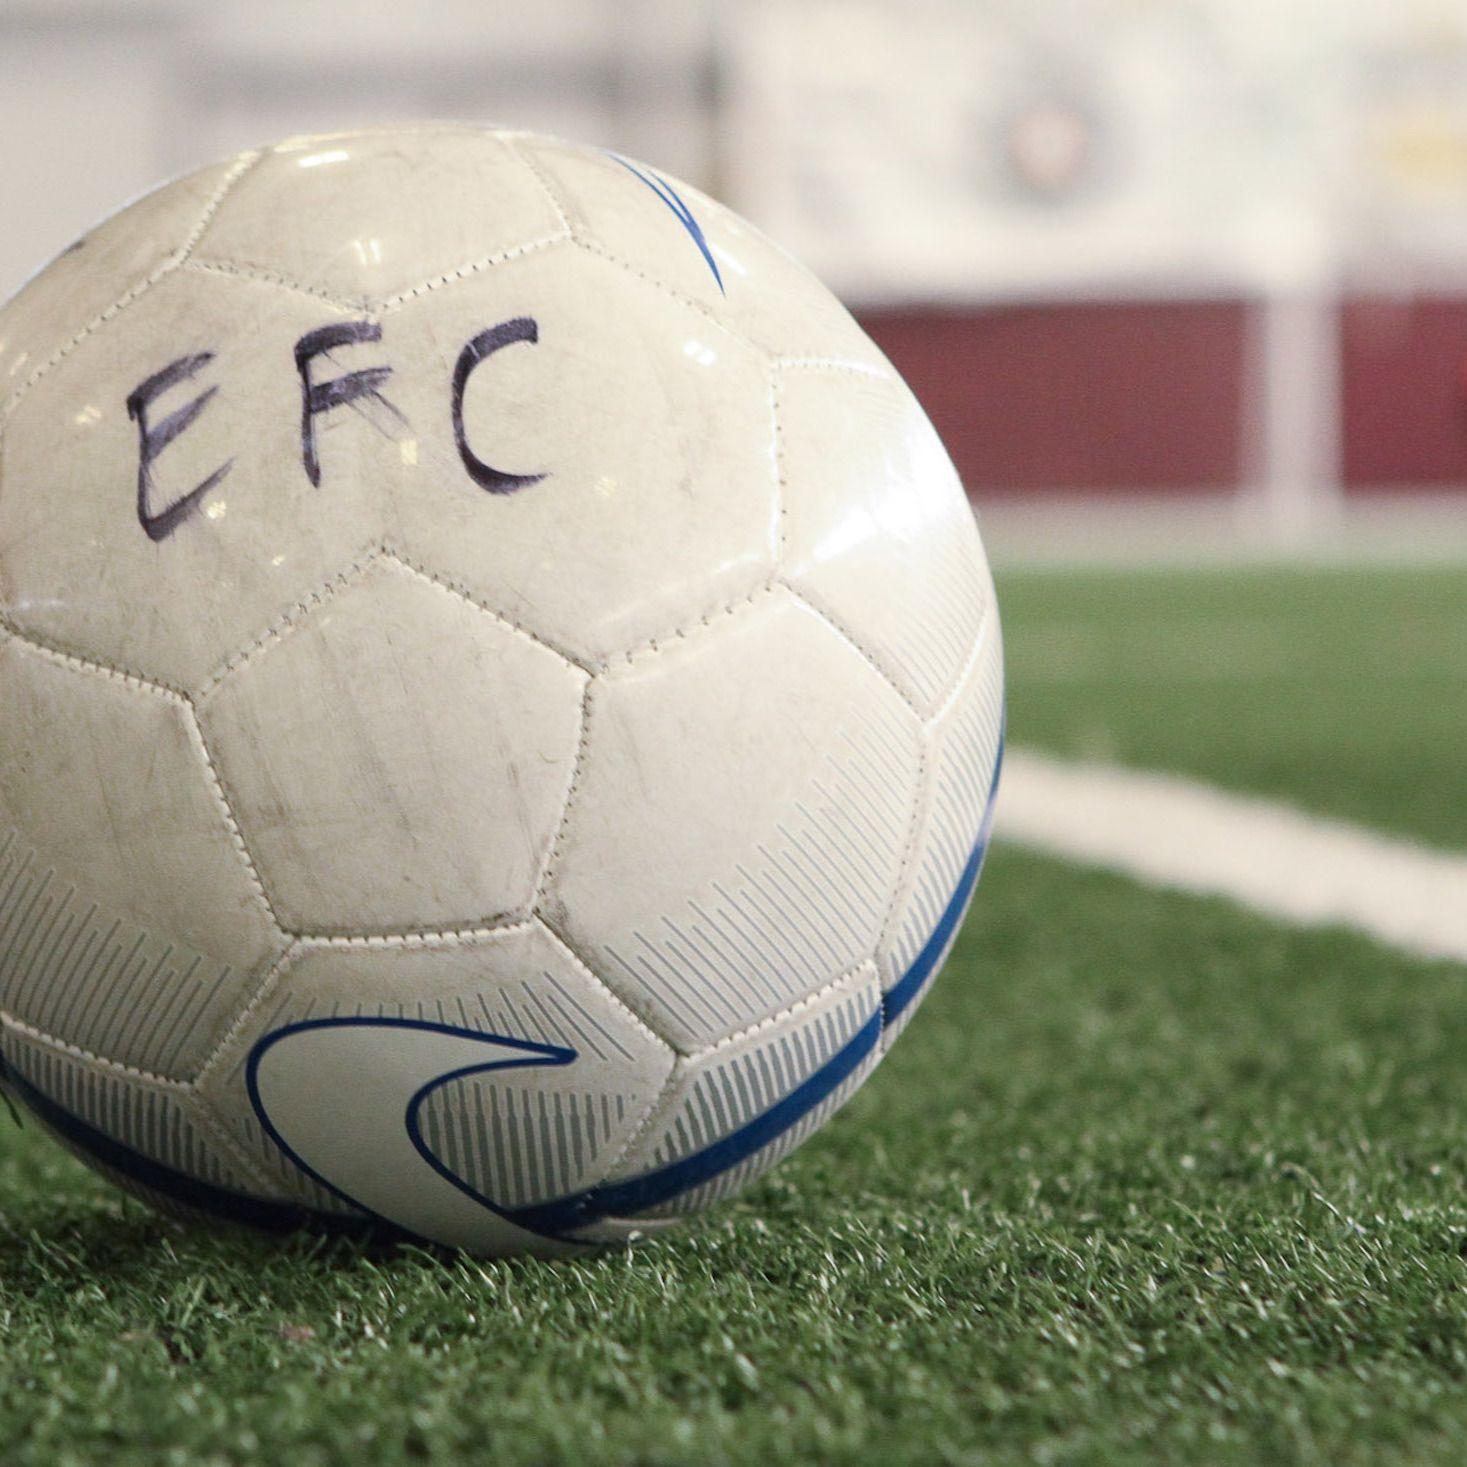 EFC Soccer Talk #43 - College Recruitment with Henry Schwartz and Drew Patterson